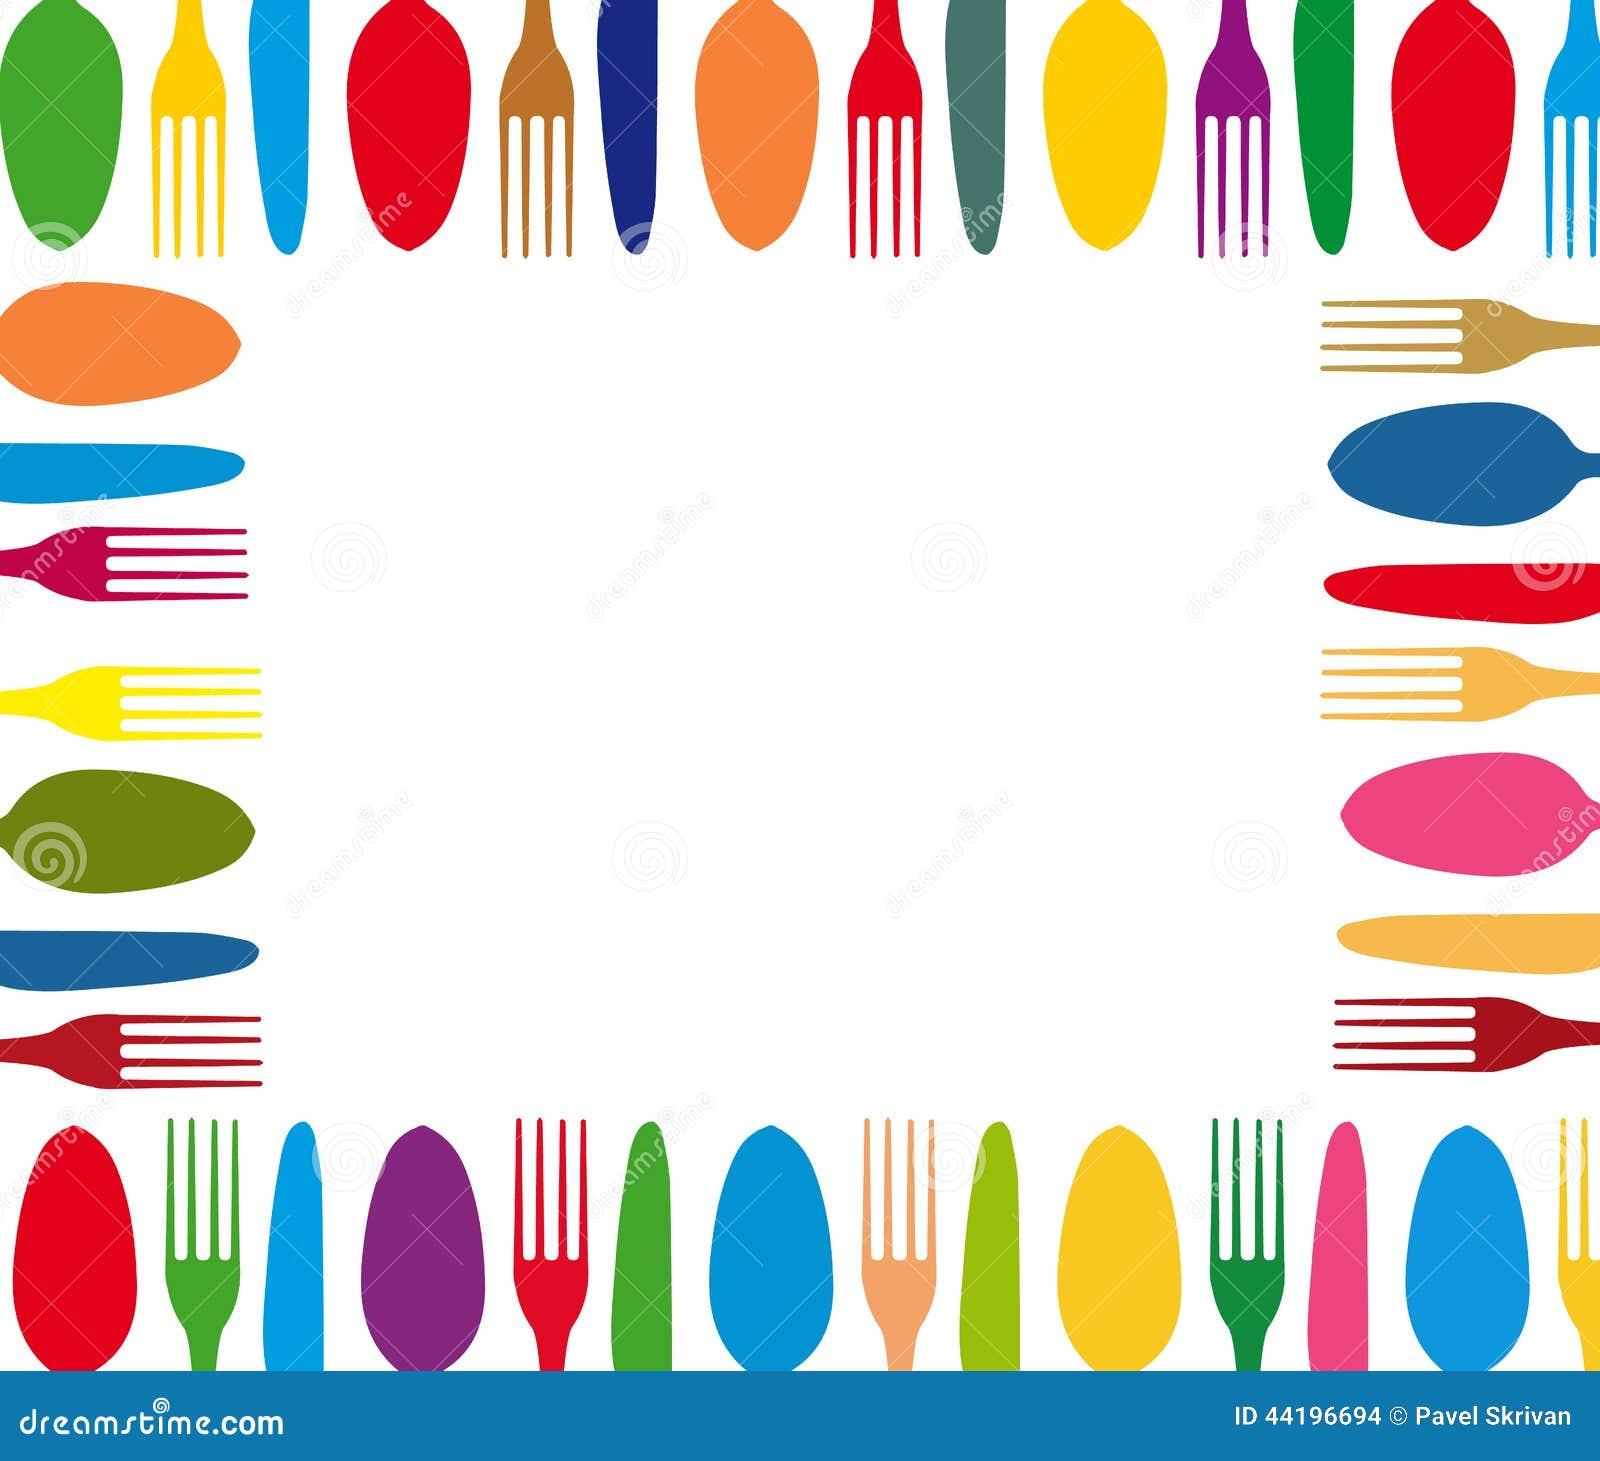 Cutlery Color Background Menu Stock Illustration - Image: 44196694